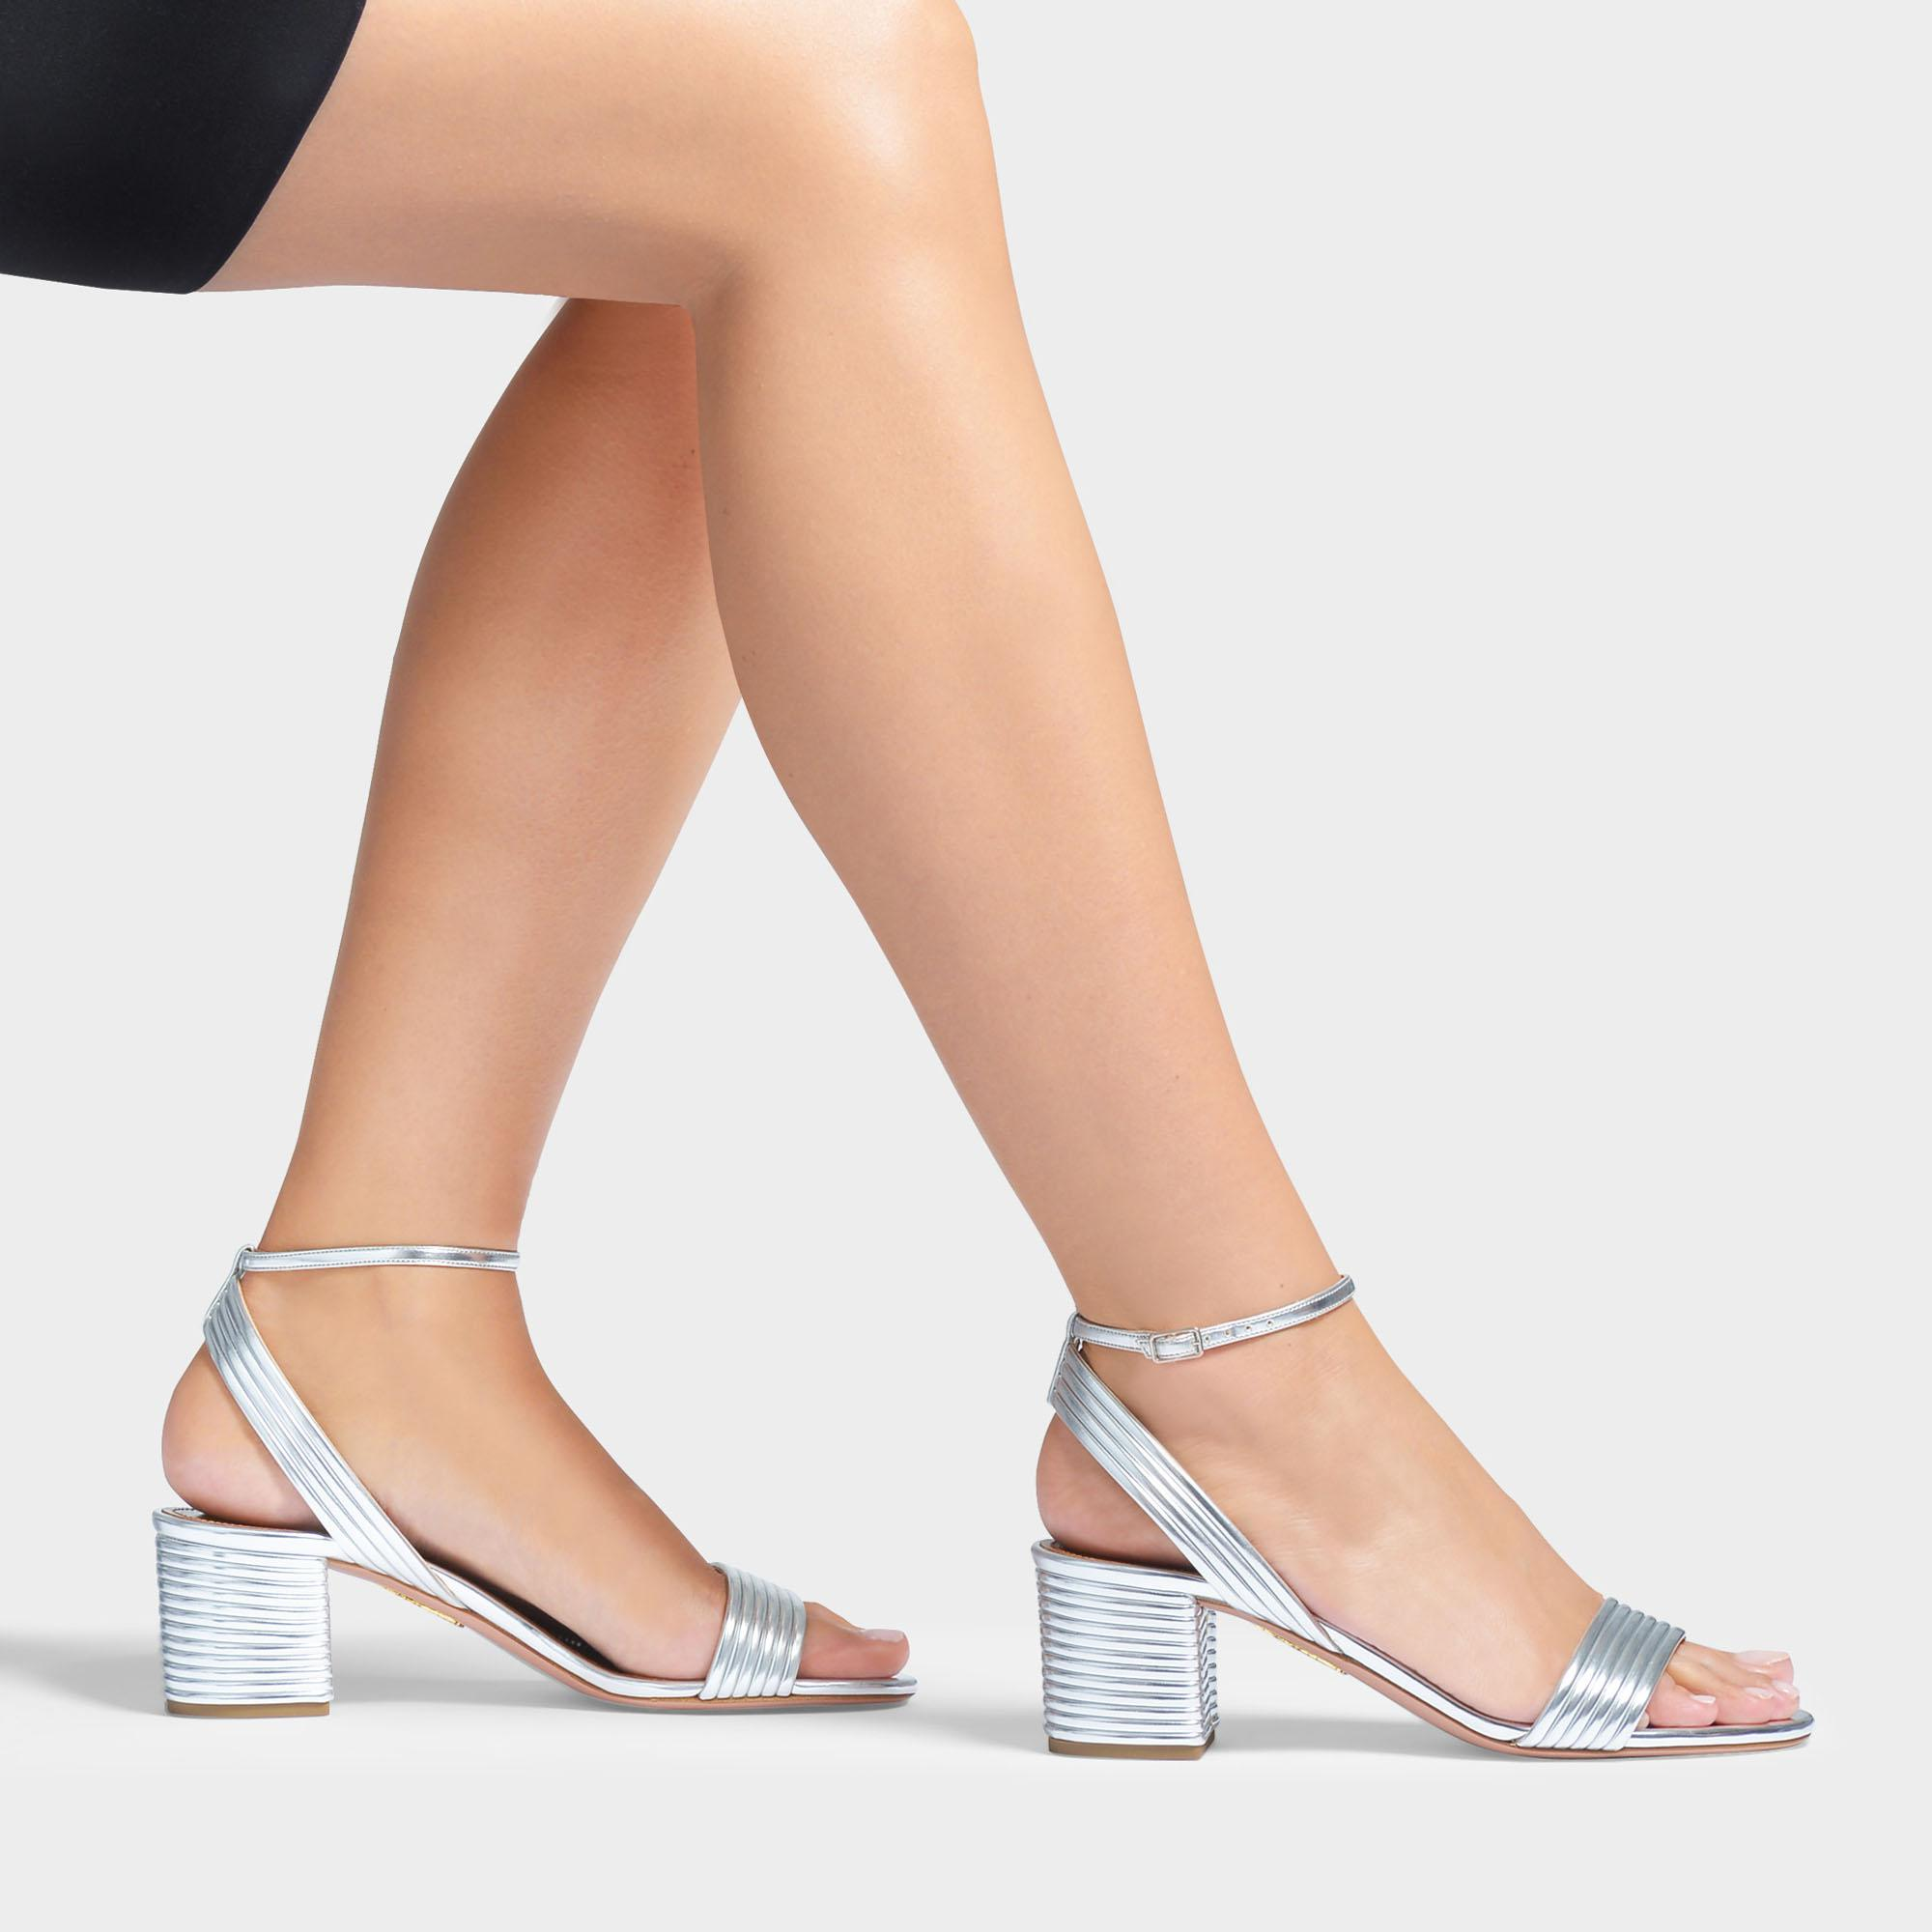 89ac59707a5 Lyst - Aquazzura Sundance Sandals 50 In Silver Laminated Leather in Gray